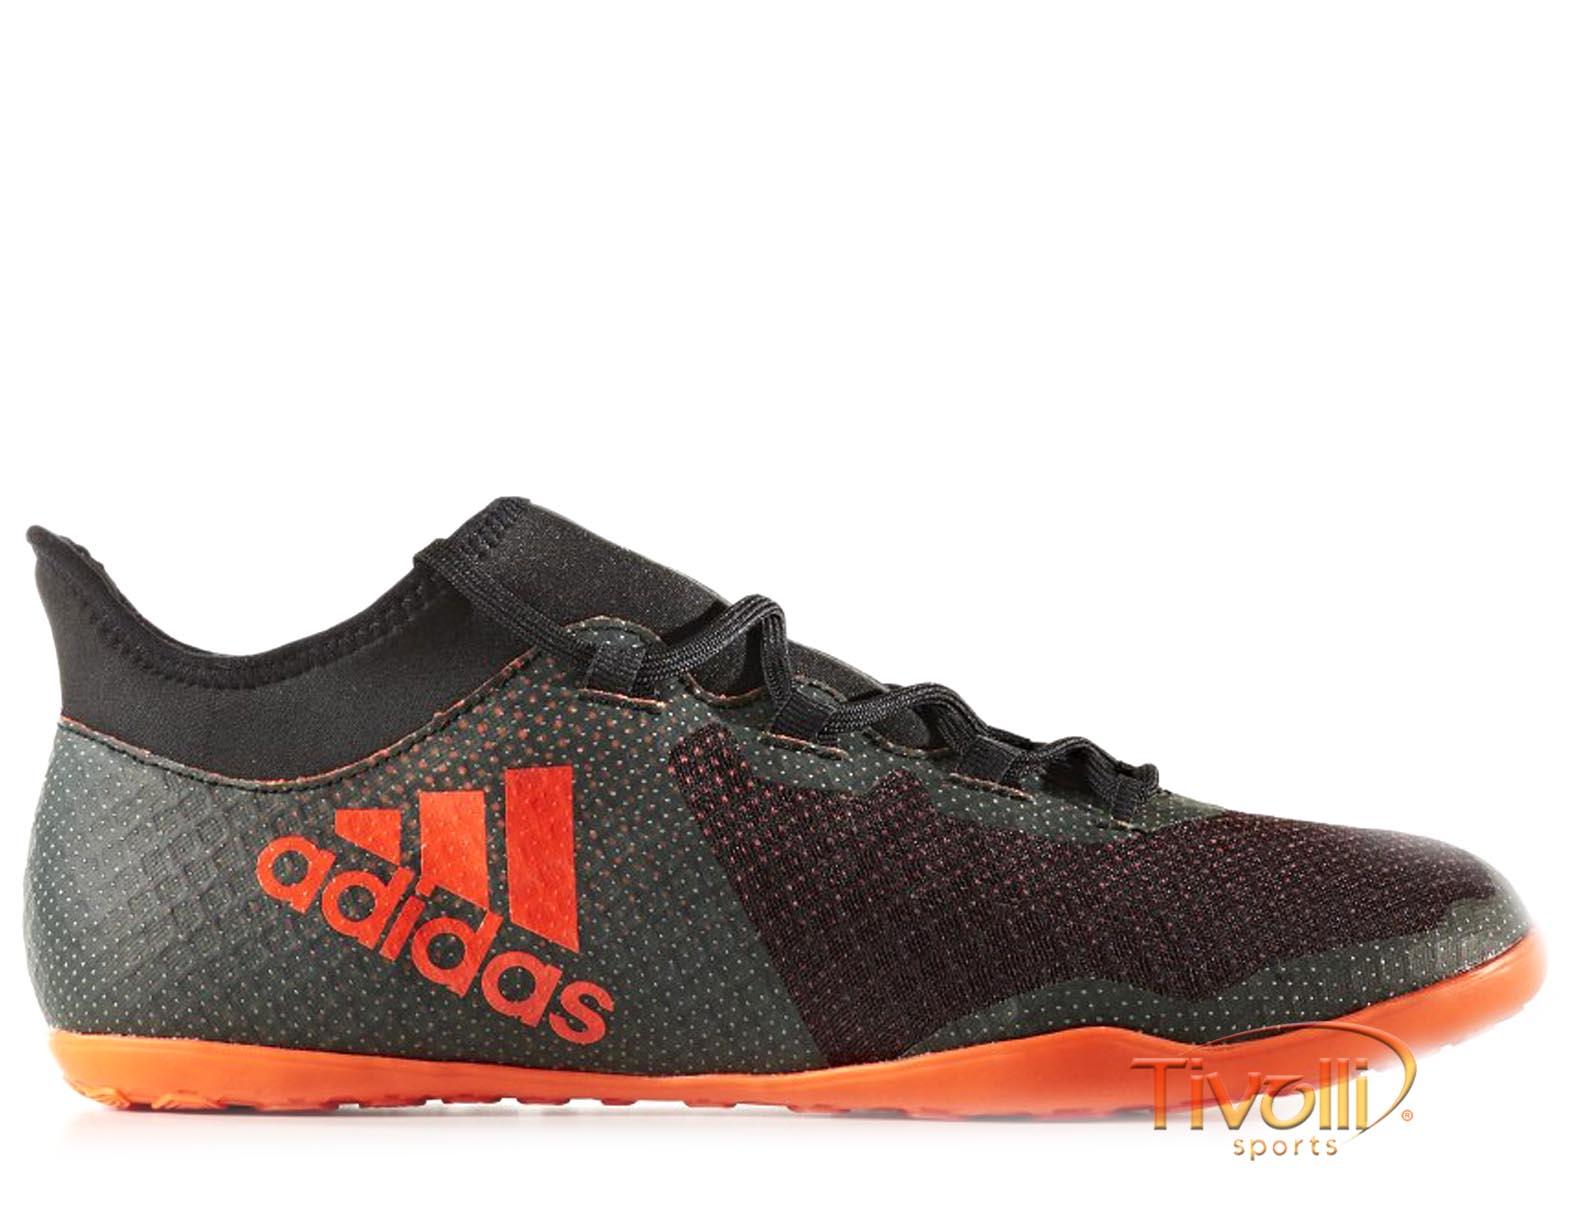 Chuteira Adidas X Tango 17.3 IN IC Futsal     dec6dbb740438